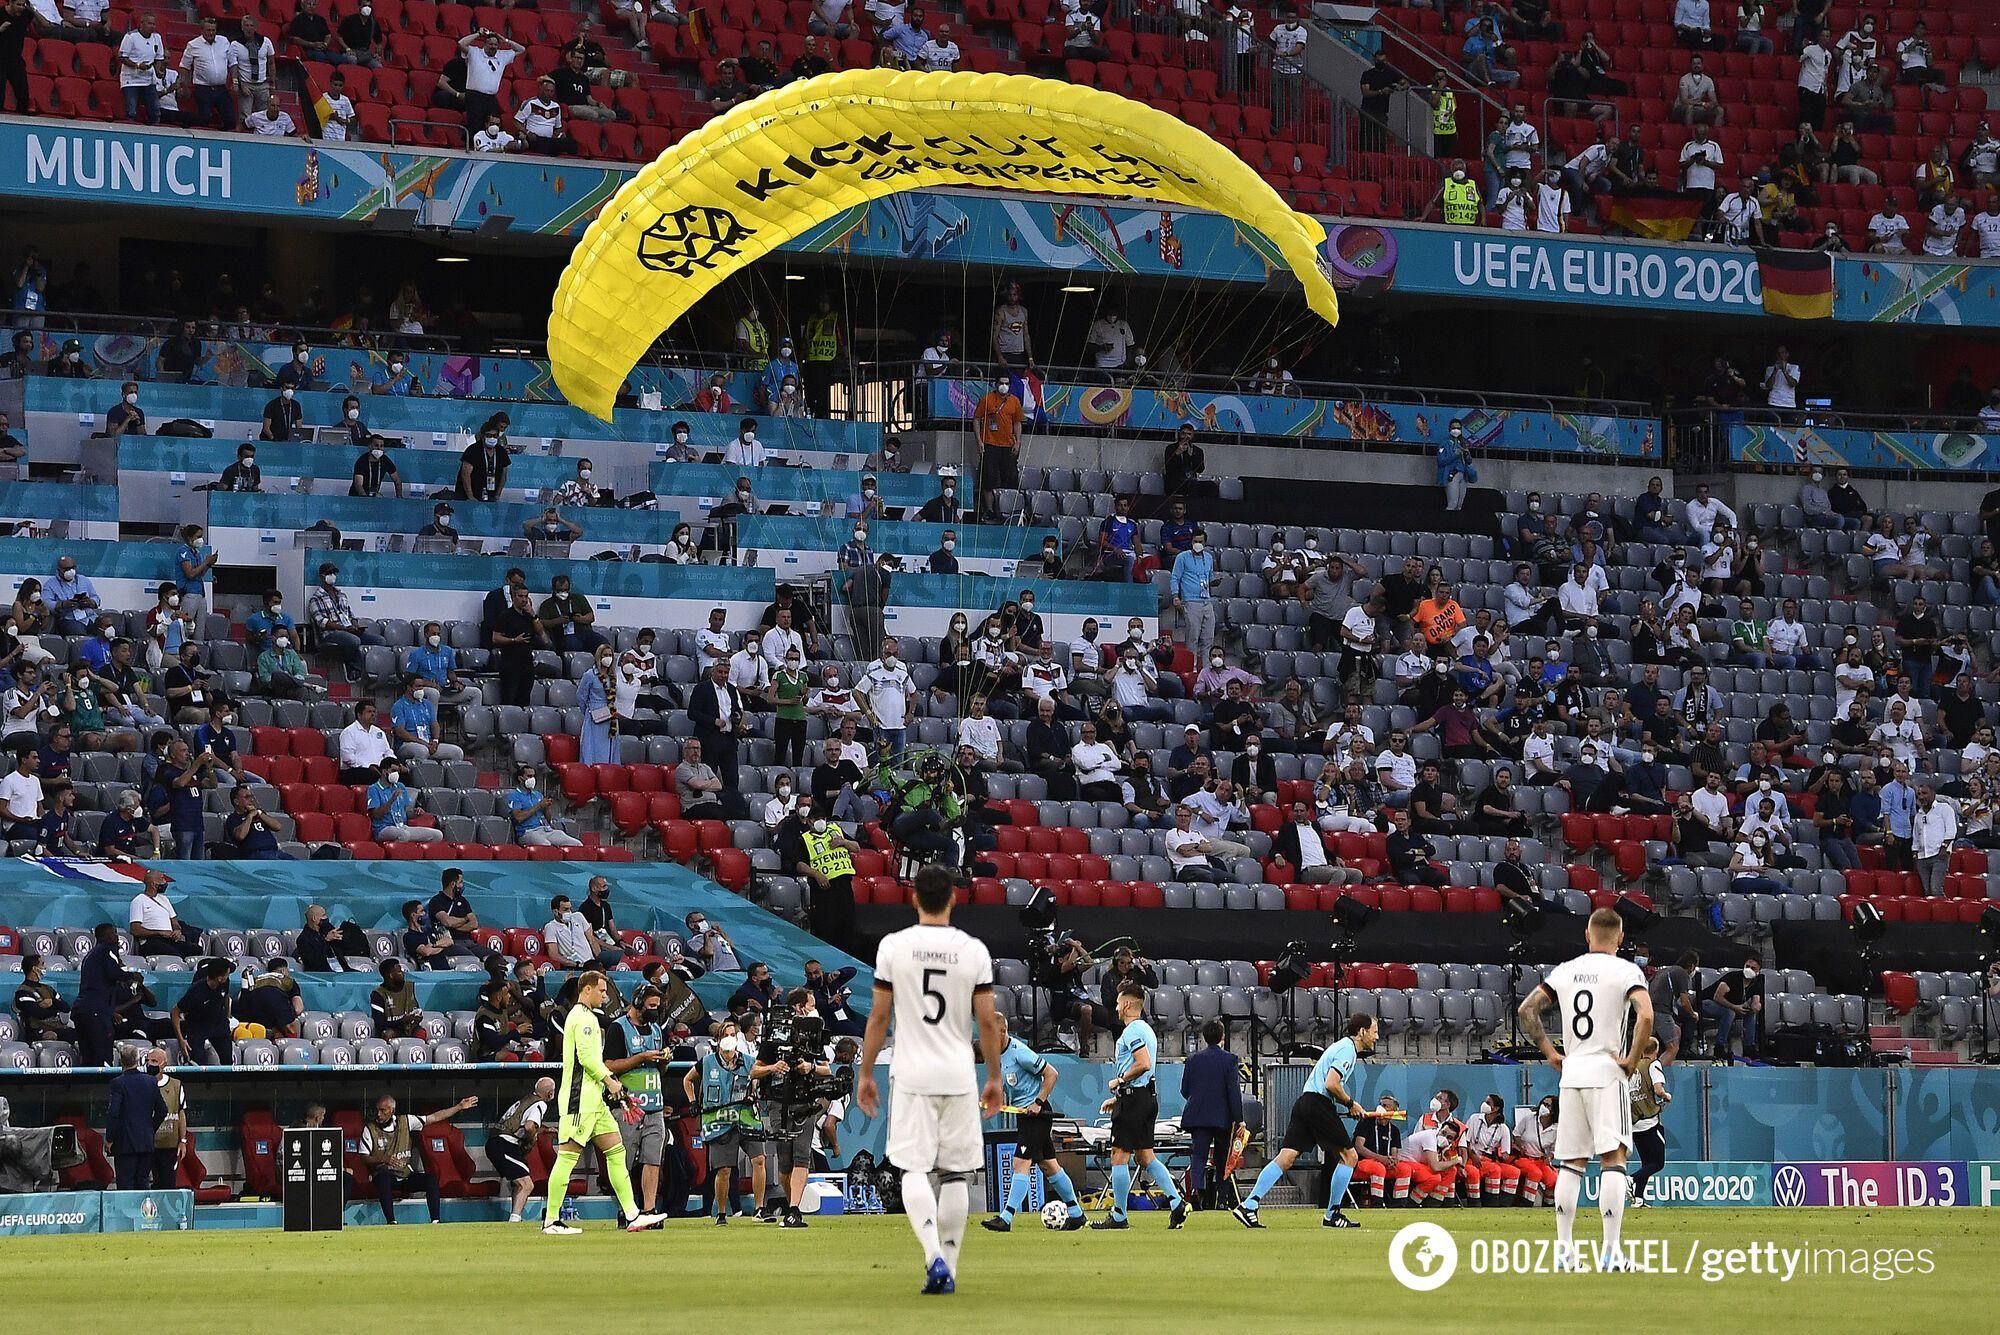 На матче Германия - Франция едва не случилась трагедия